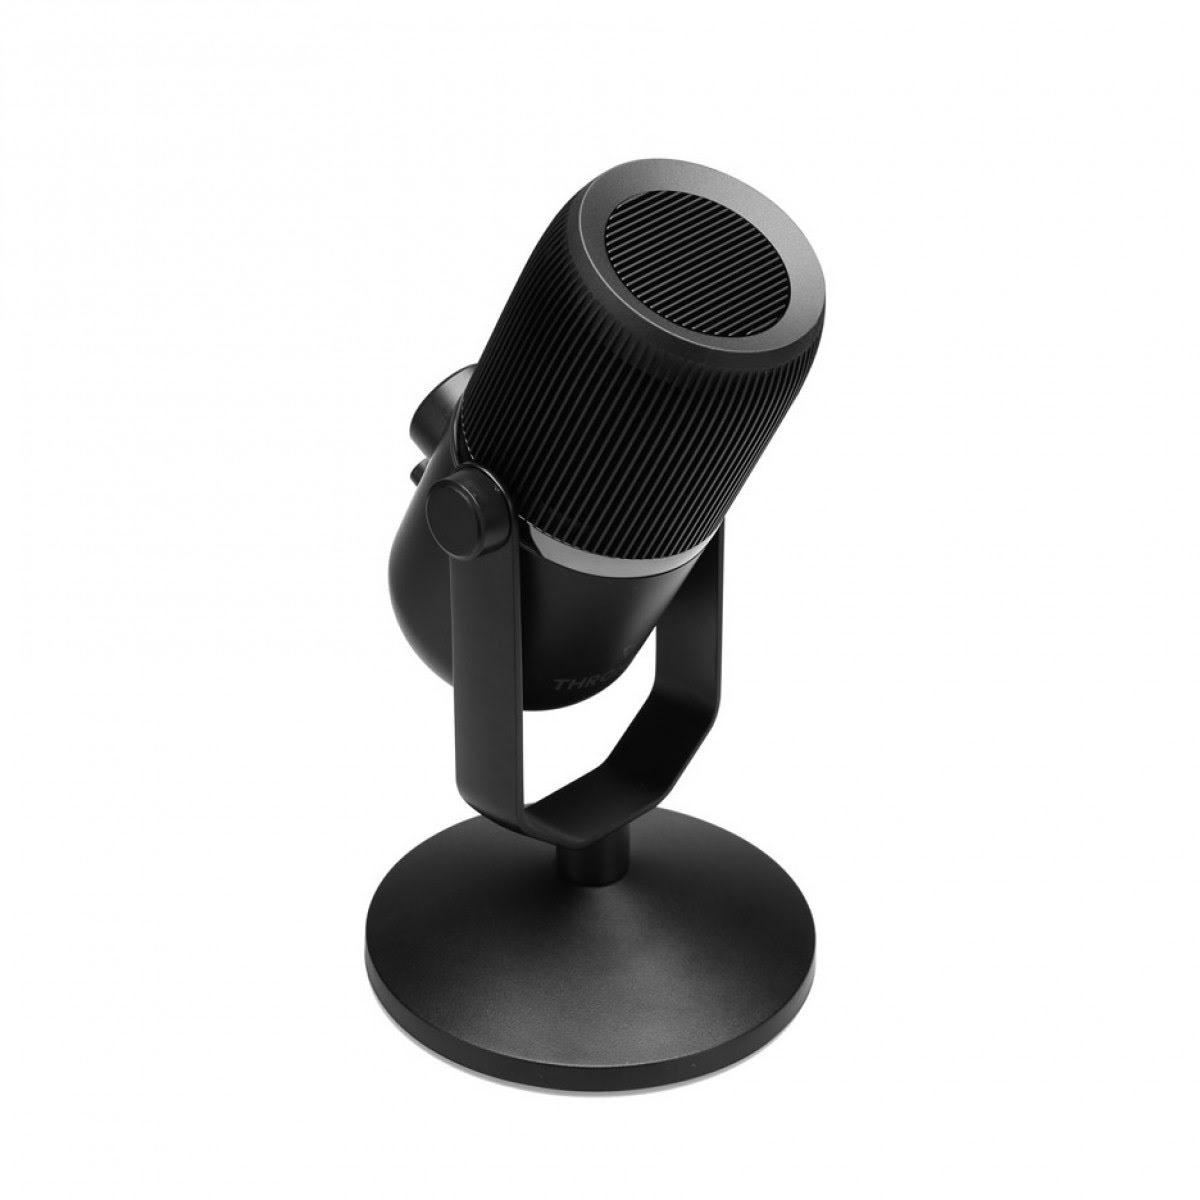 MDRILL Zero Plus - Black (THRON_M4_PLUS) - Achat / Vente Micro-casque sur Picata.fr - 2